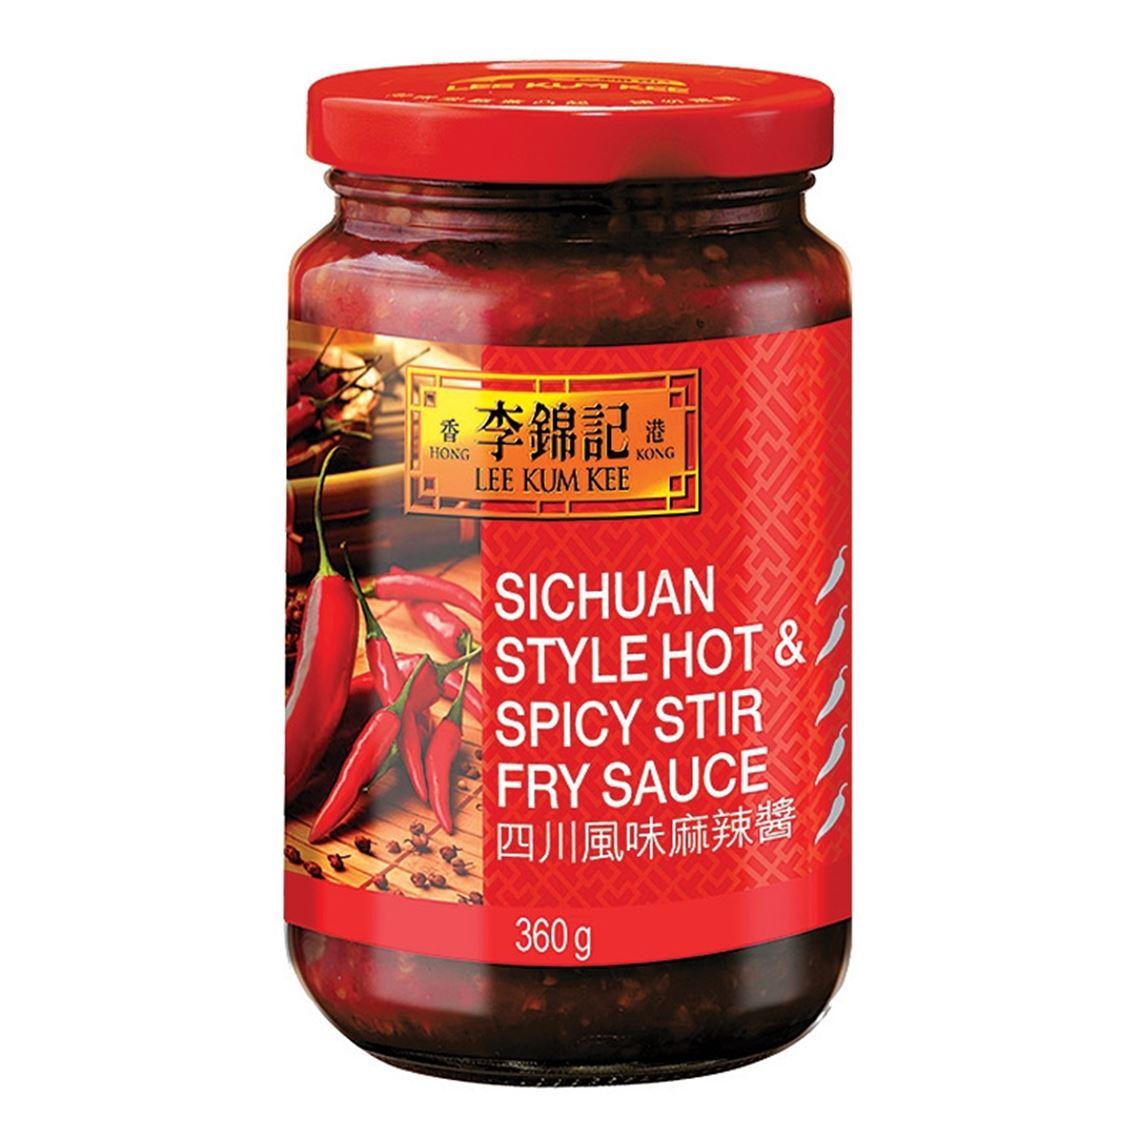 Sichuan Style Hot & Spicy Stir Fry Sauce 360g